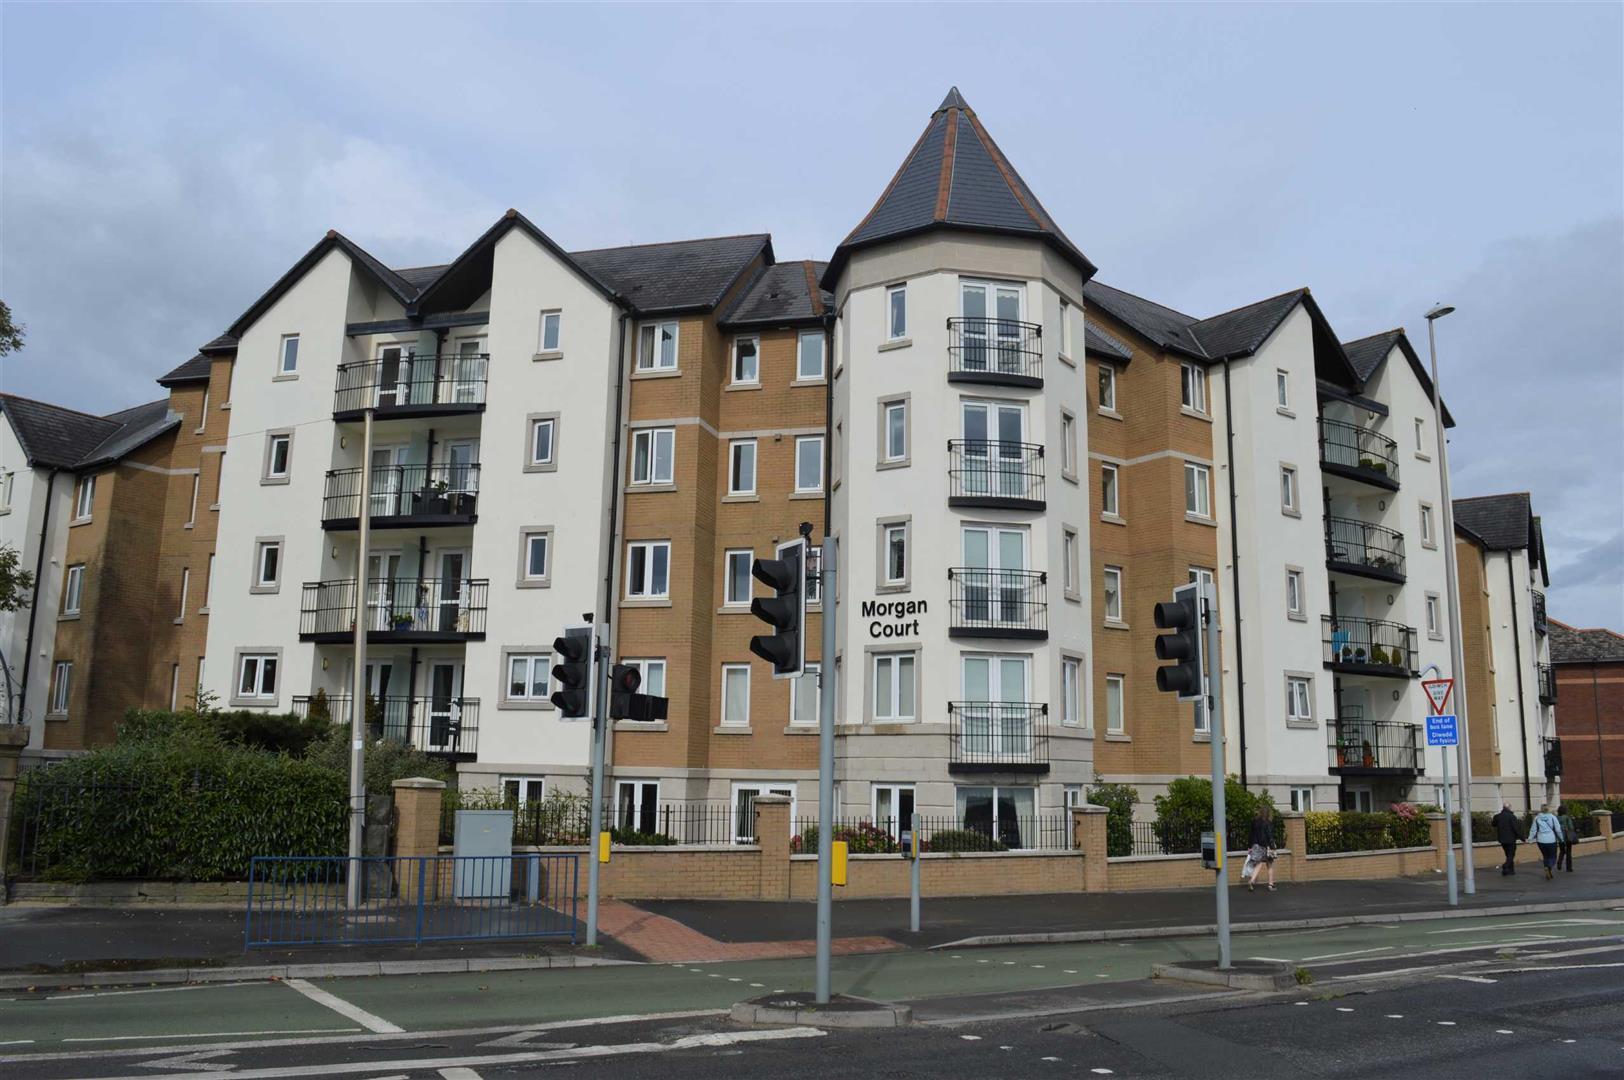 Morgan Court, Swansea, SA1 3UP